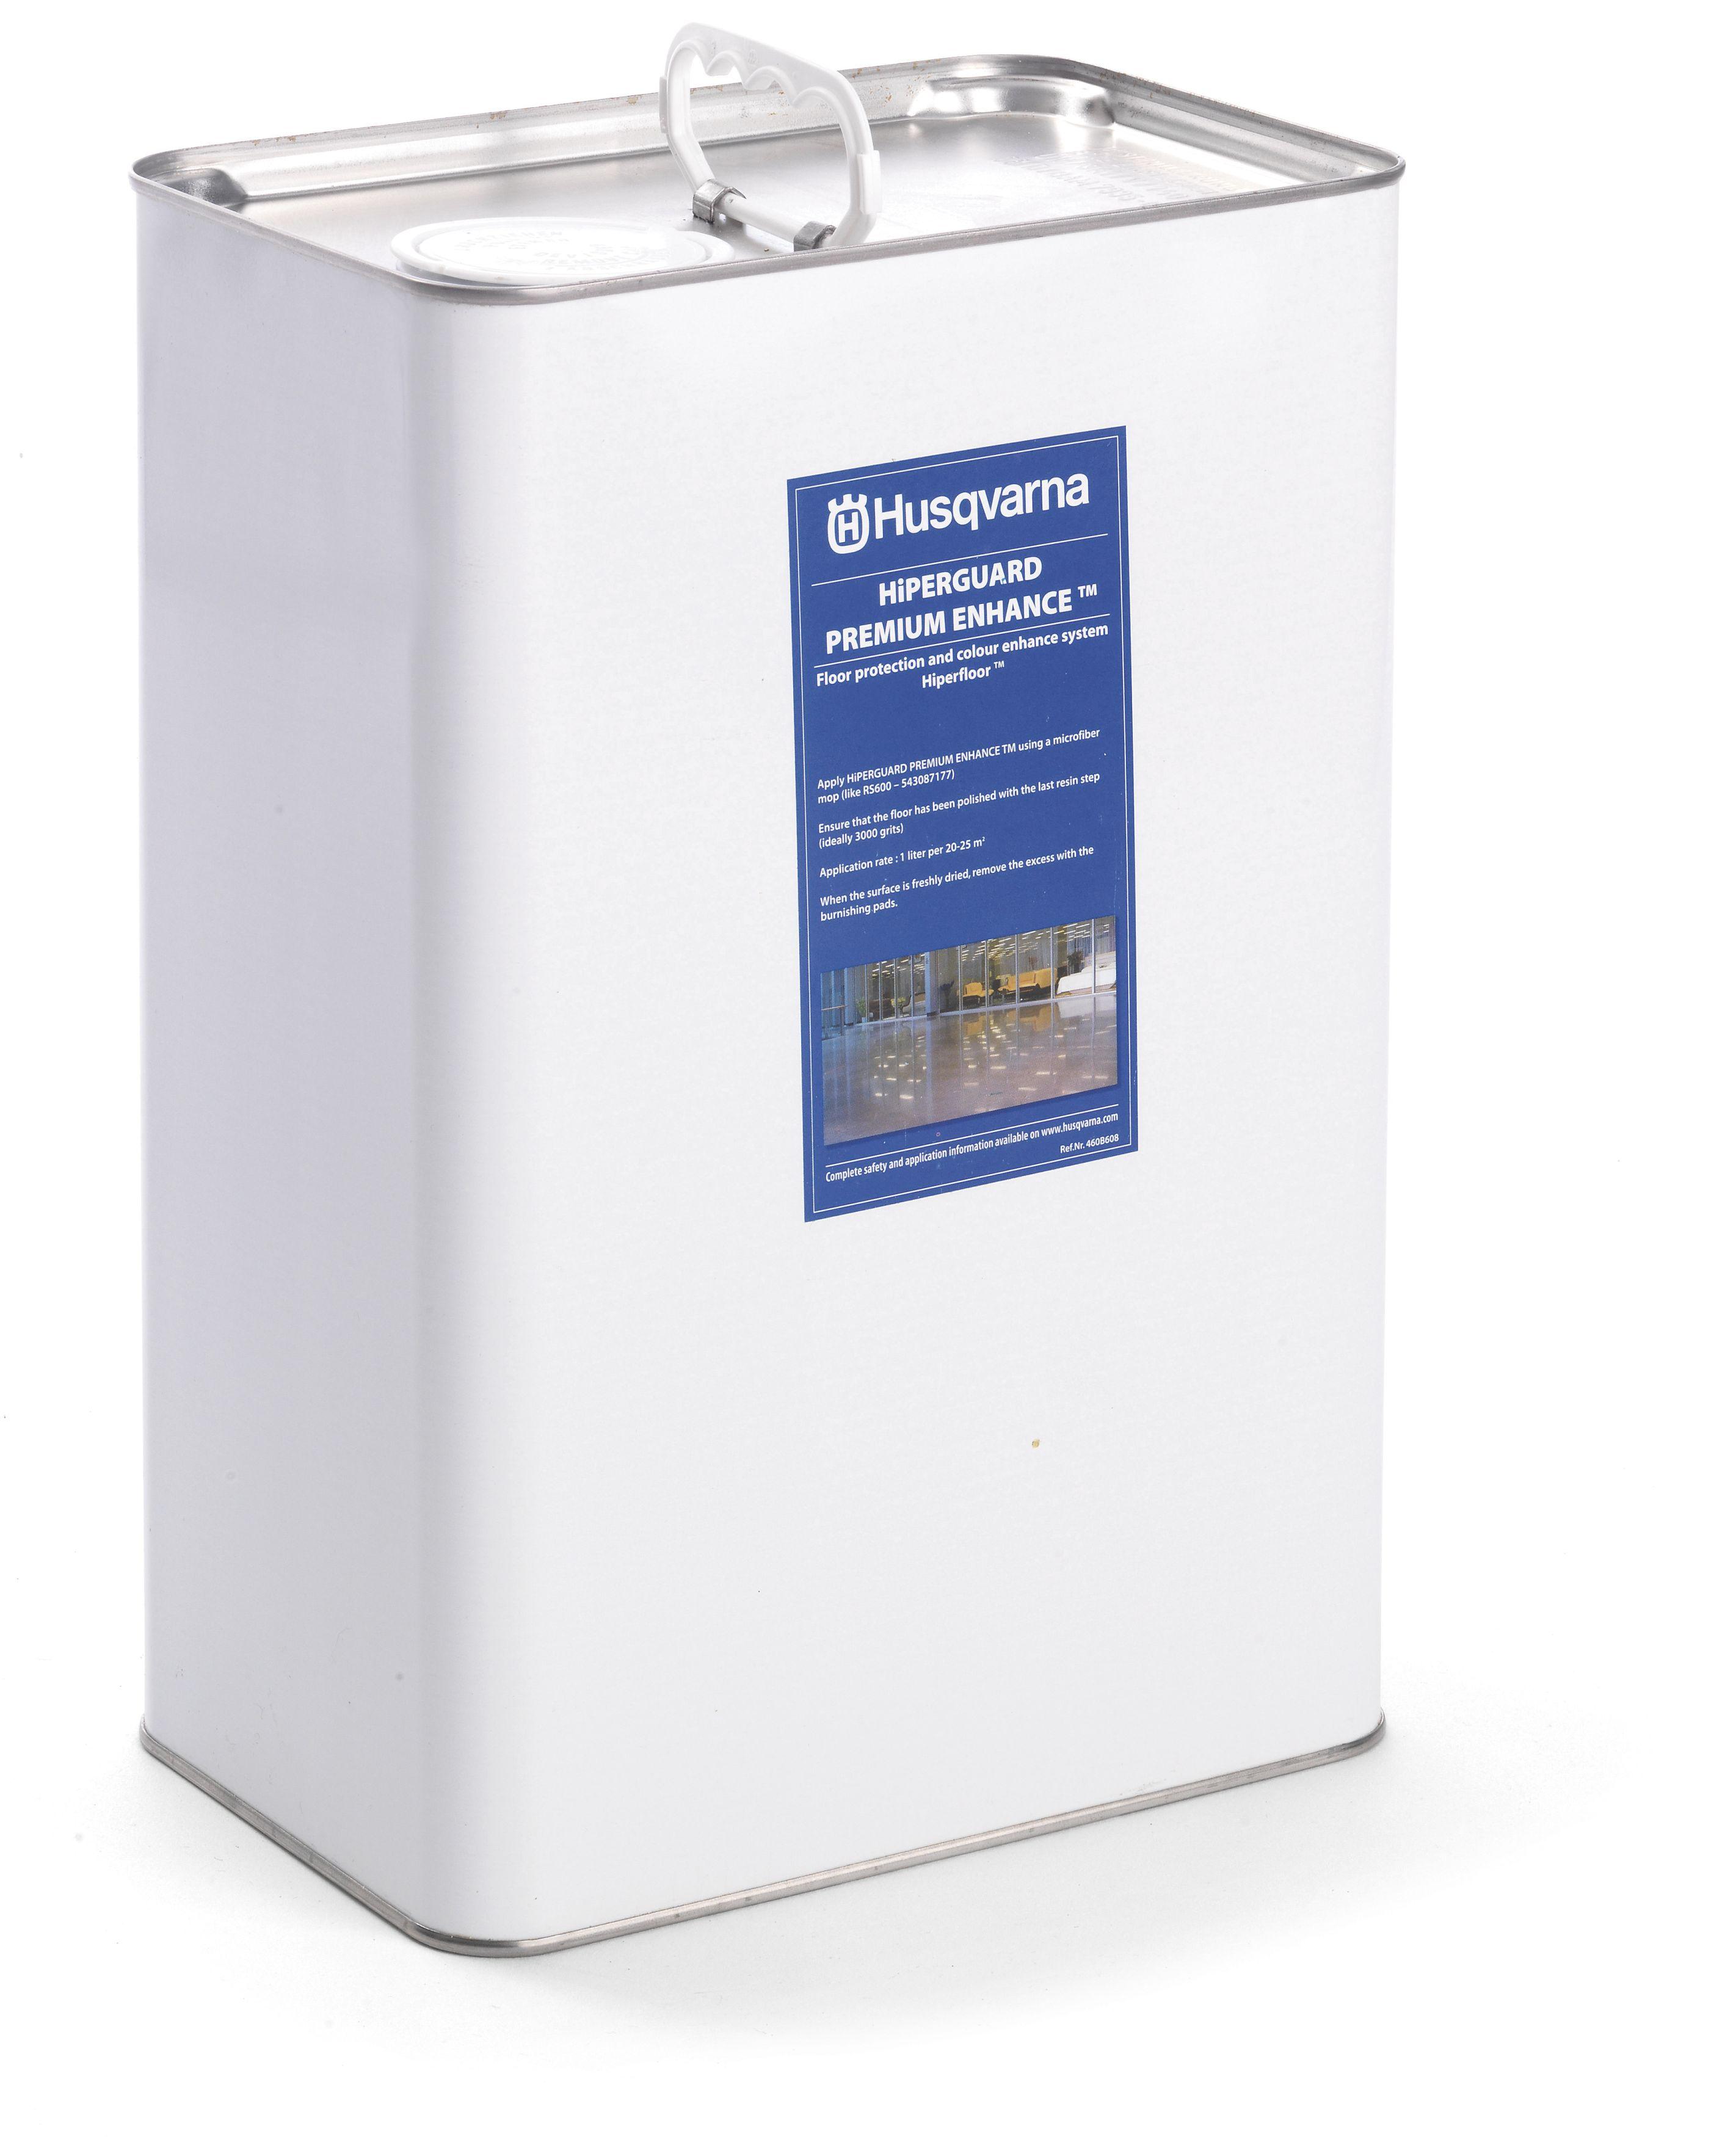 Husqvarna Hiperguard Premium Enhance